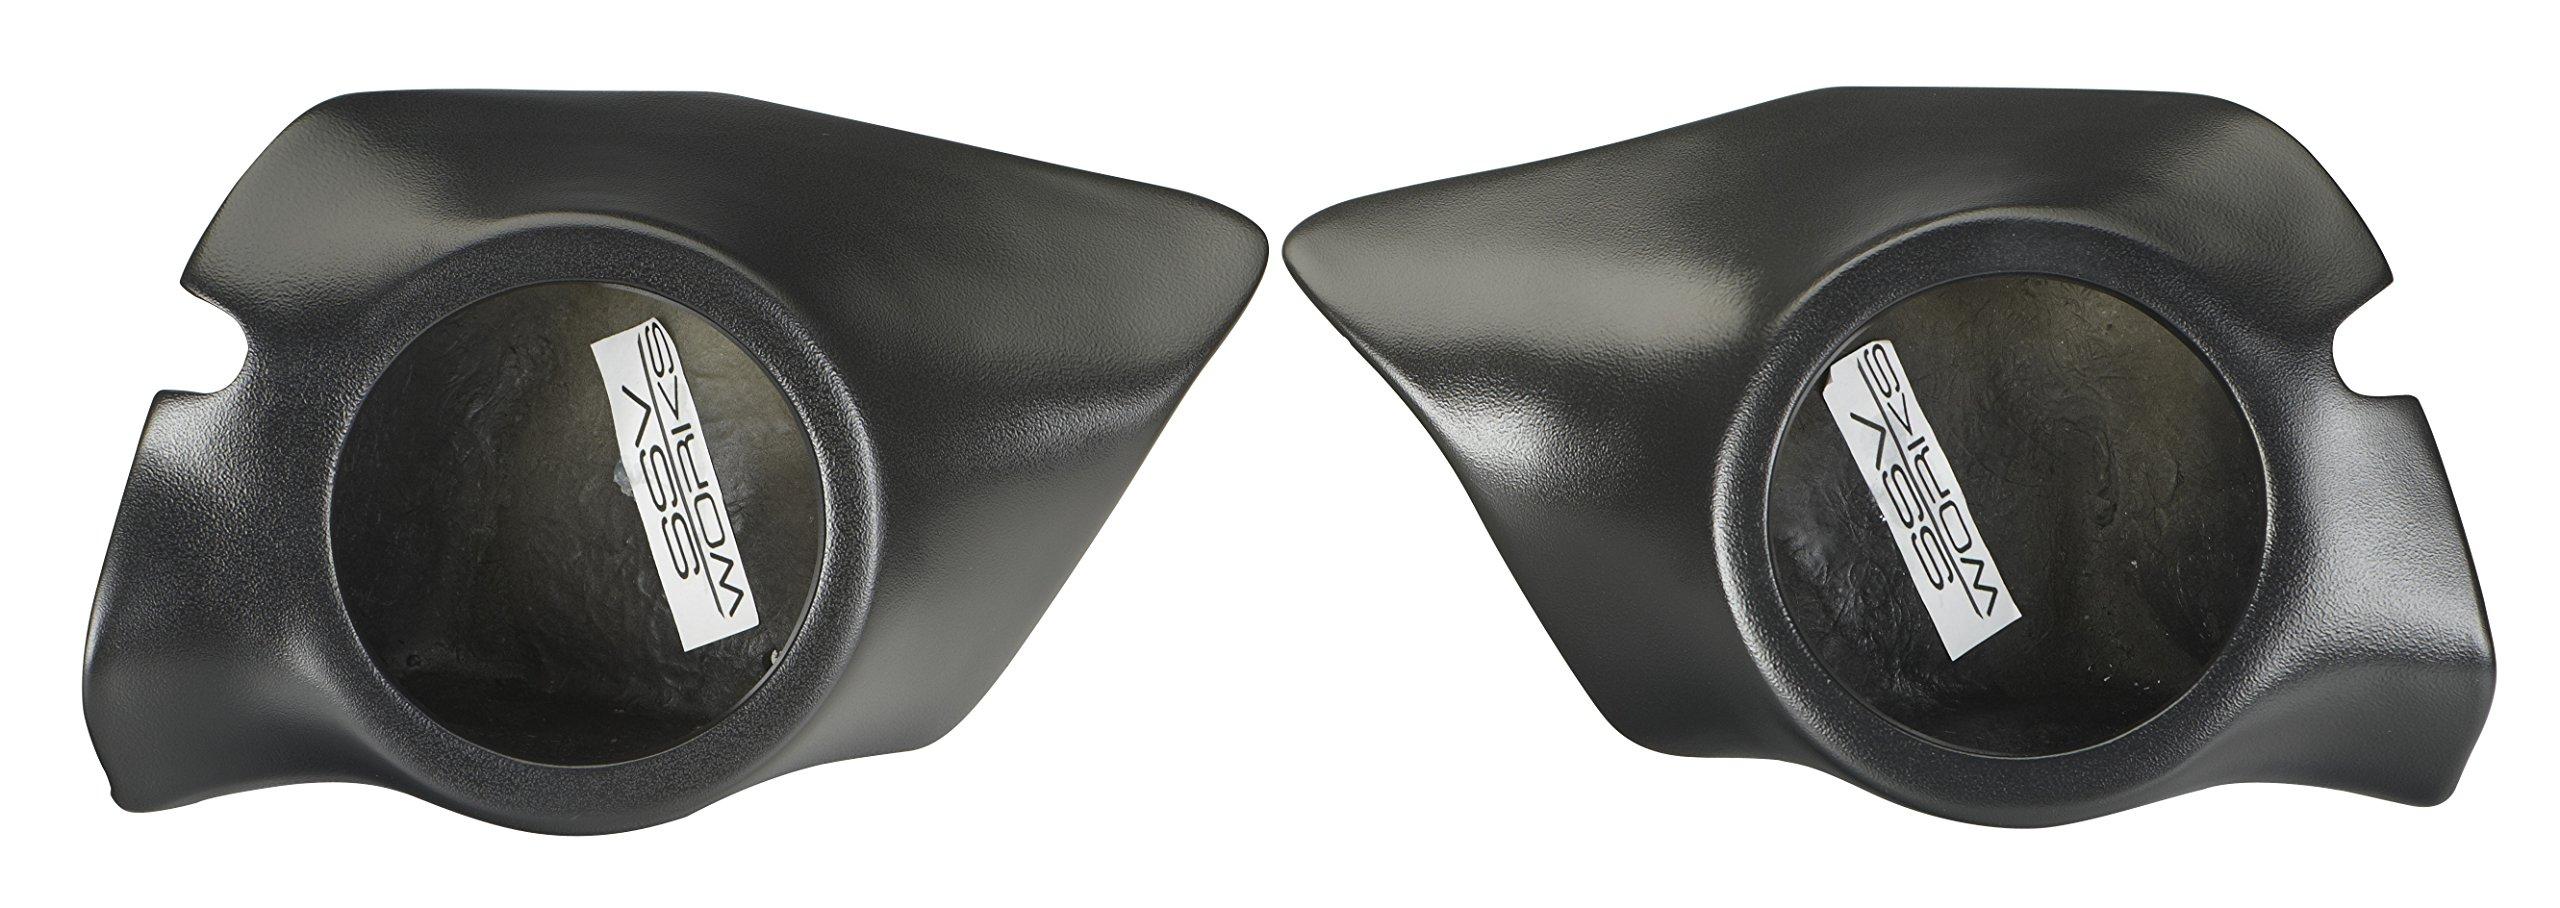 SSV 2014-2017 Polaris RZR 1000/900S/Turbo 6.5'' Speaker Pods, Front Kick Panels by SSV Works